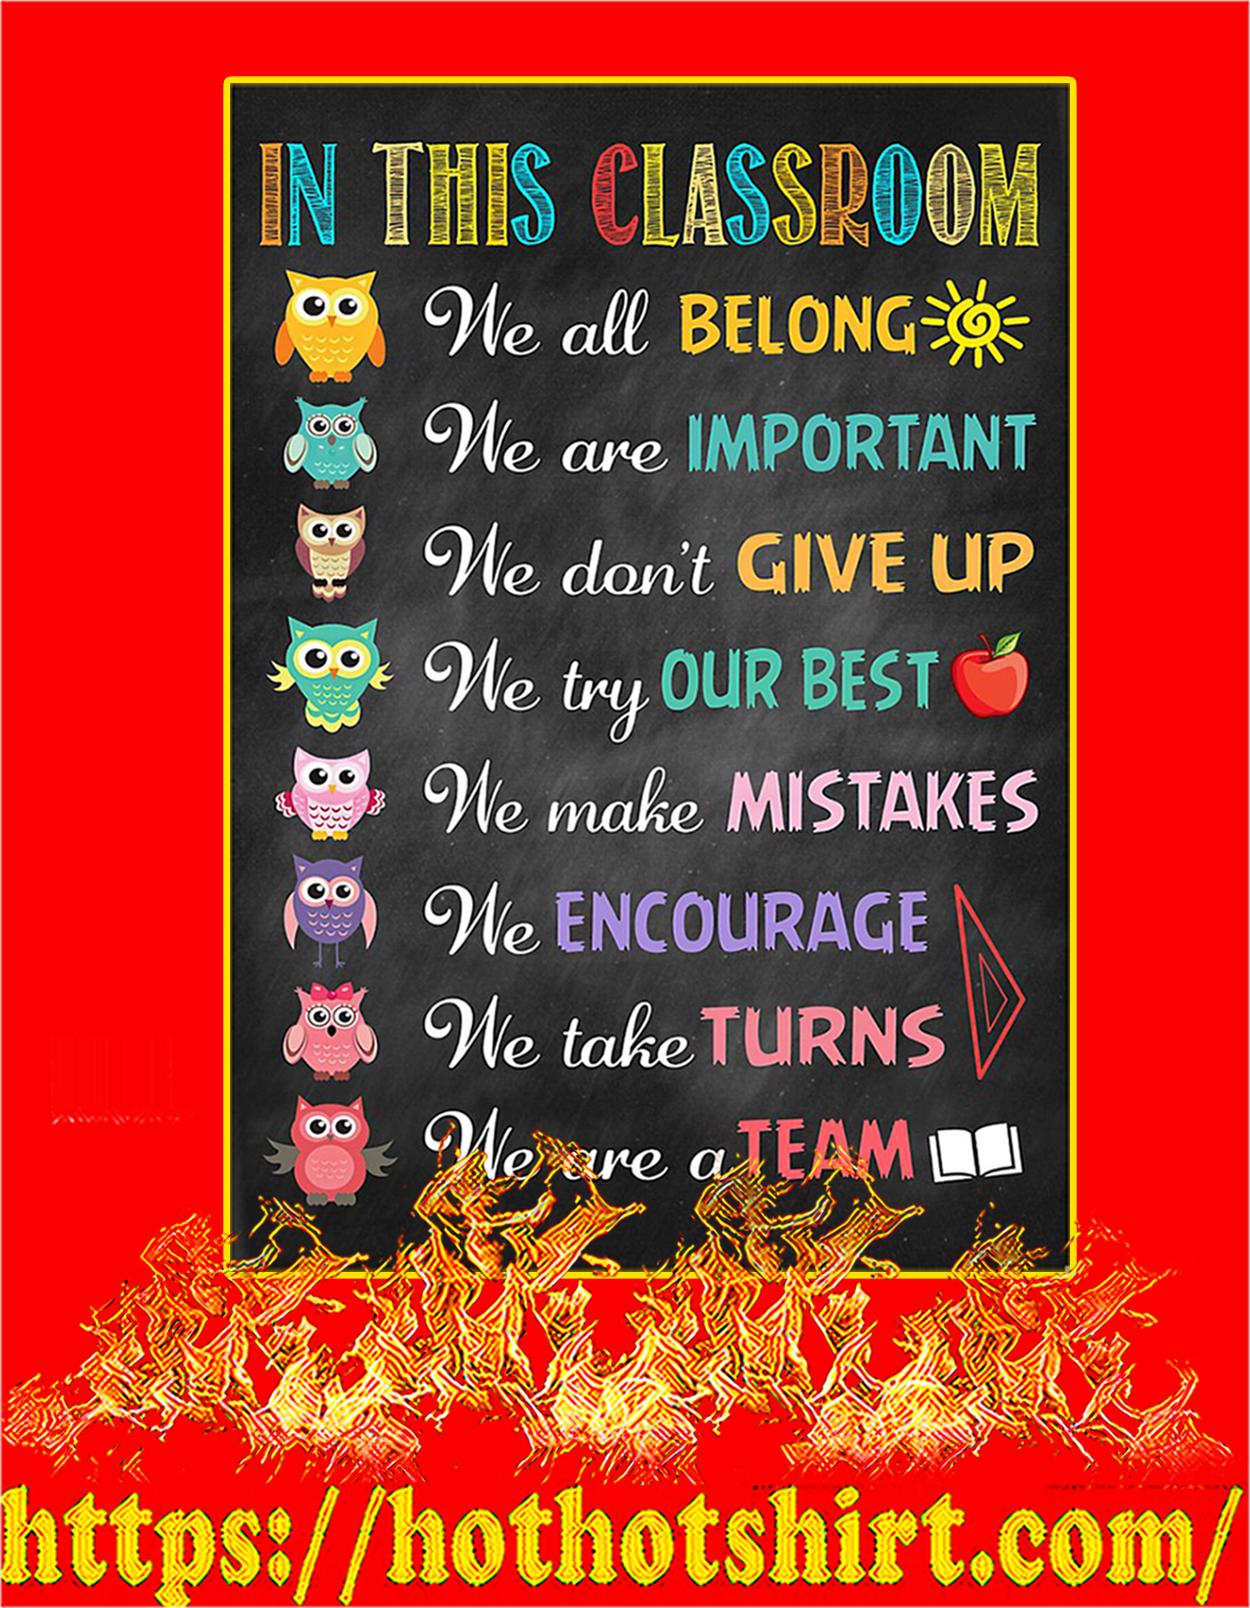 Owl teacher in this classroom we all belong poster - A3